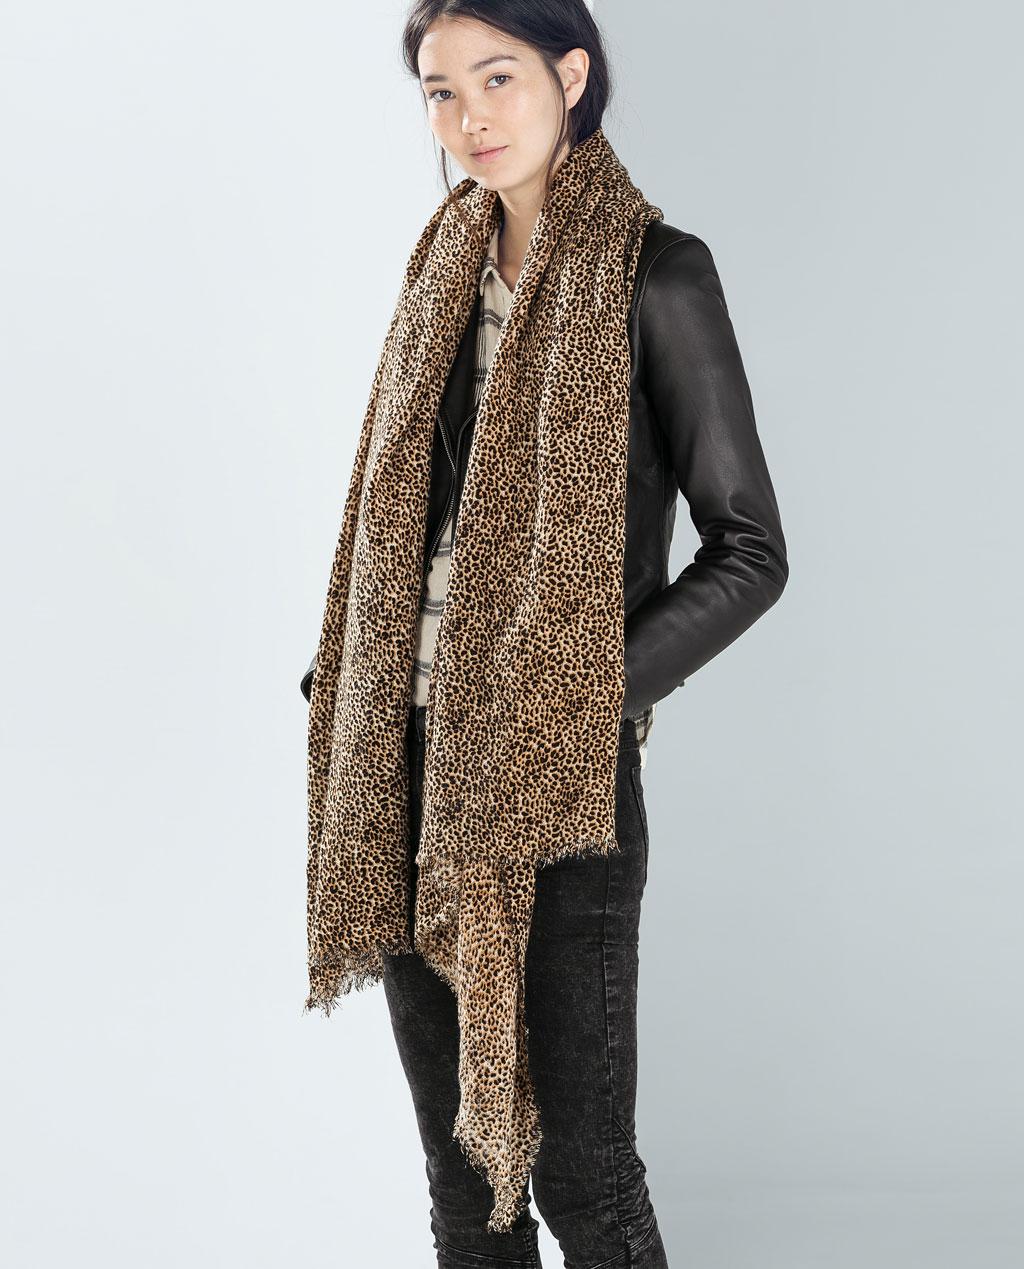 Zara Animal Print Scarf | Leopard Print Fall 2014